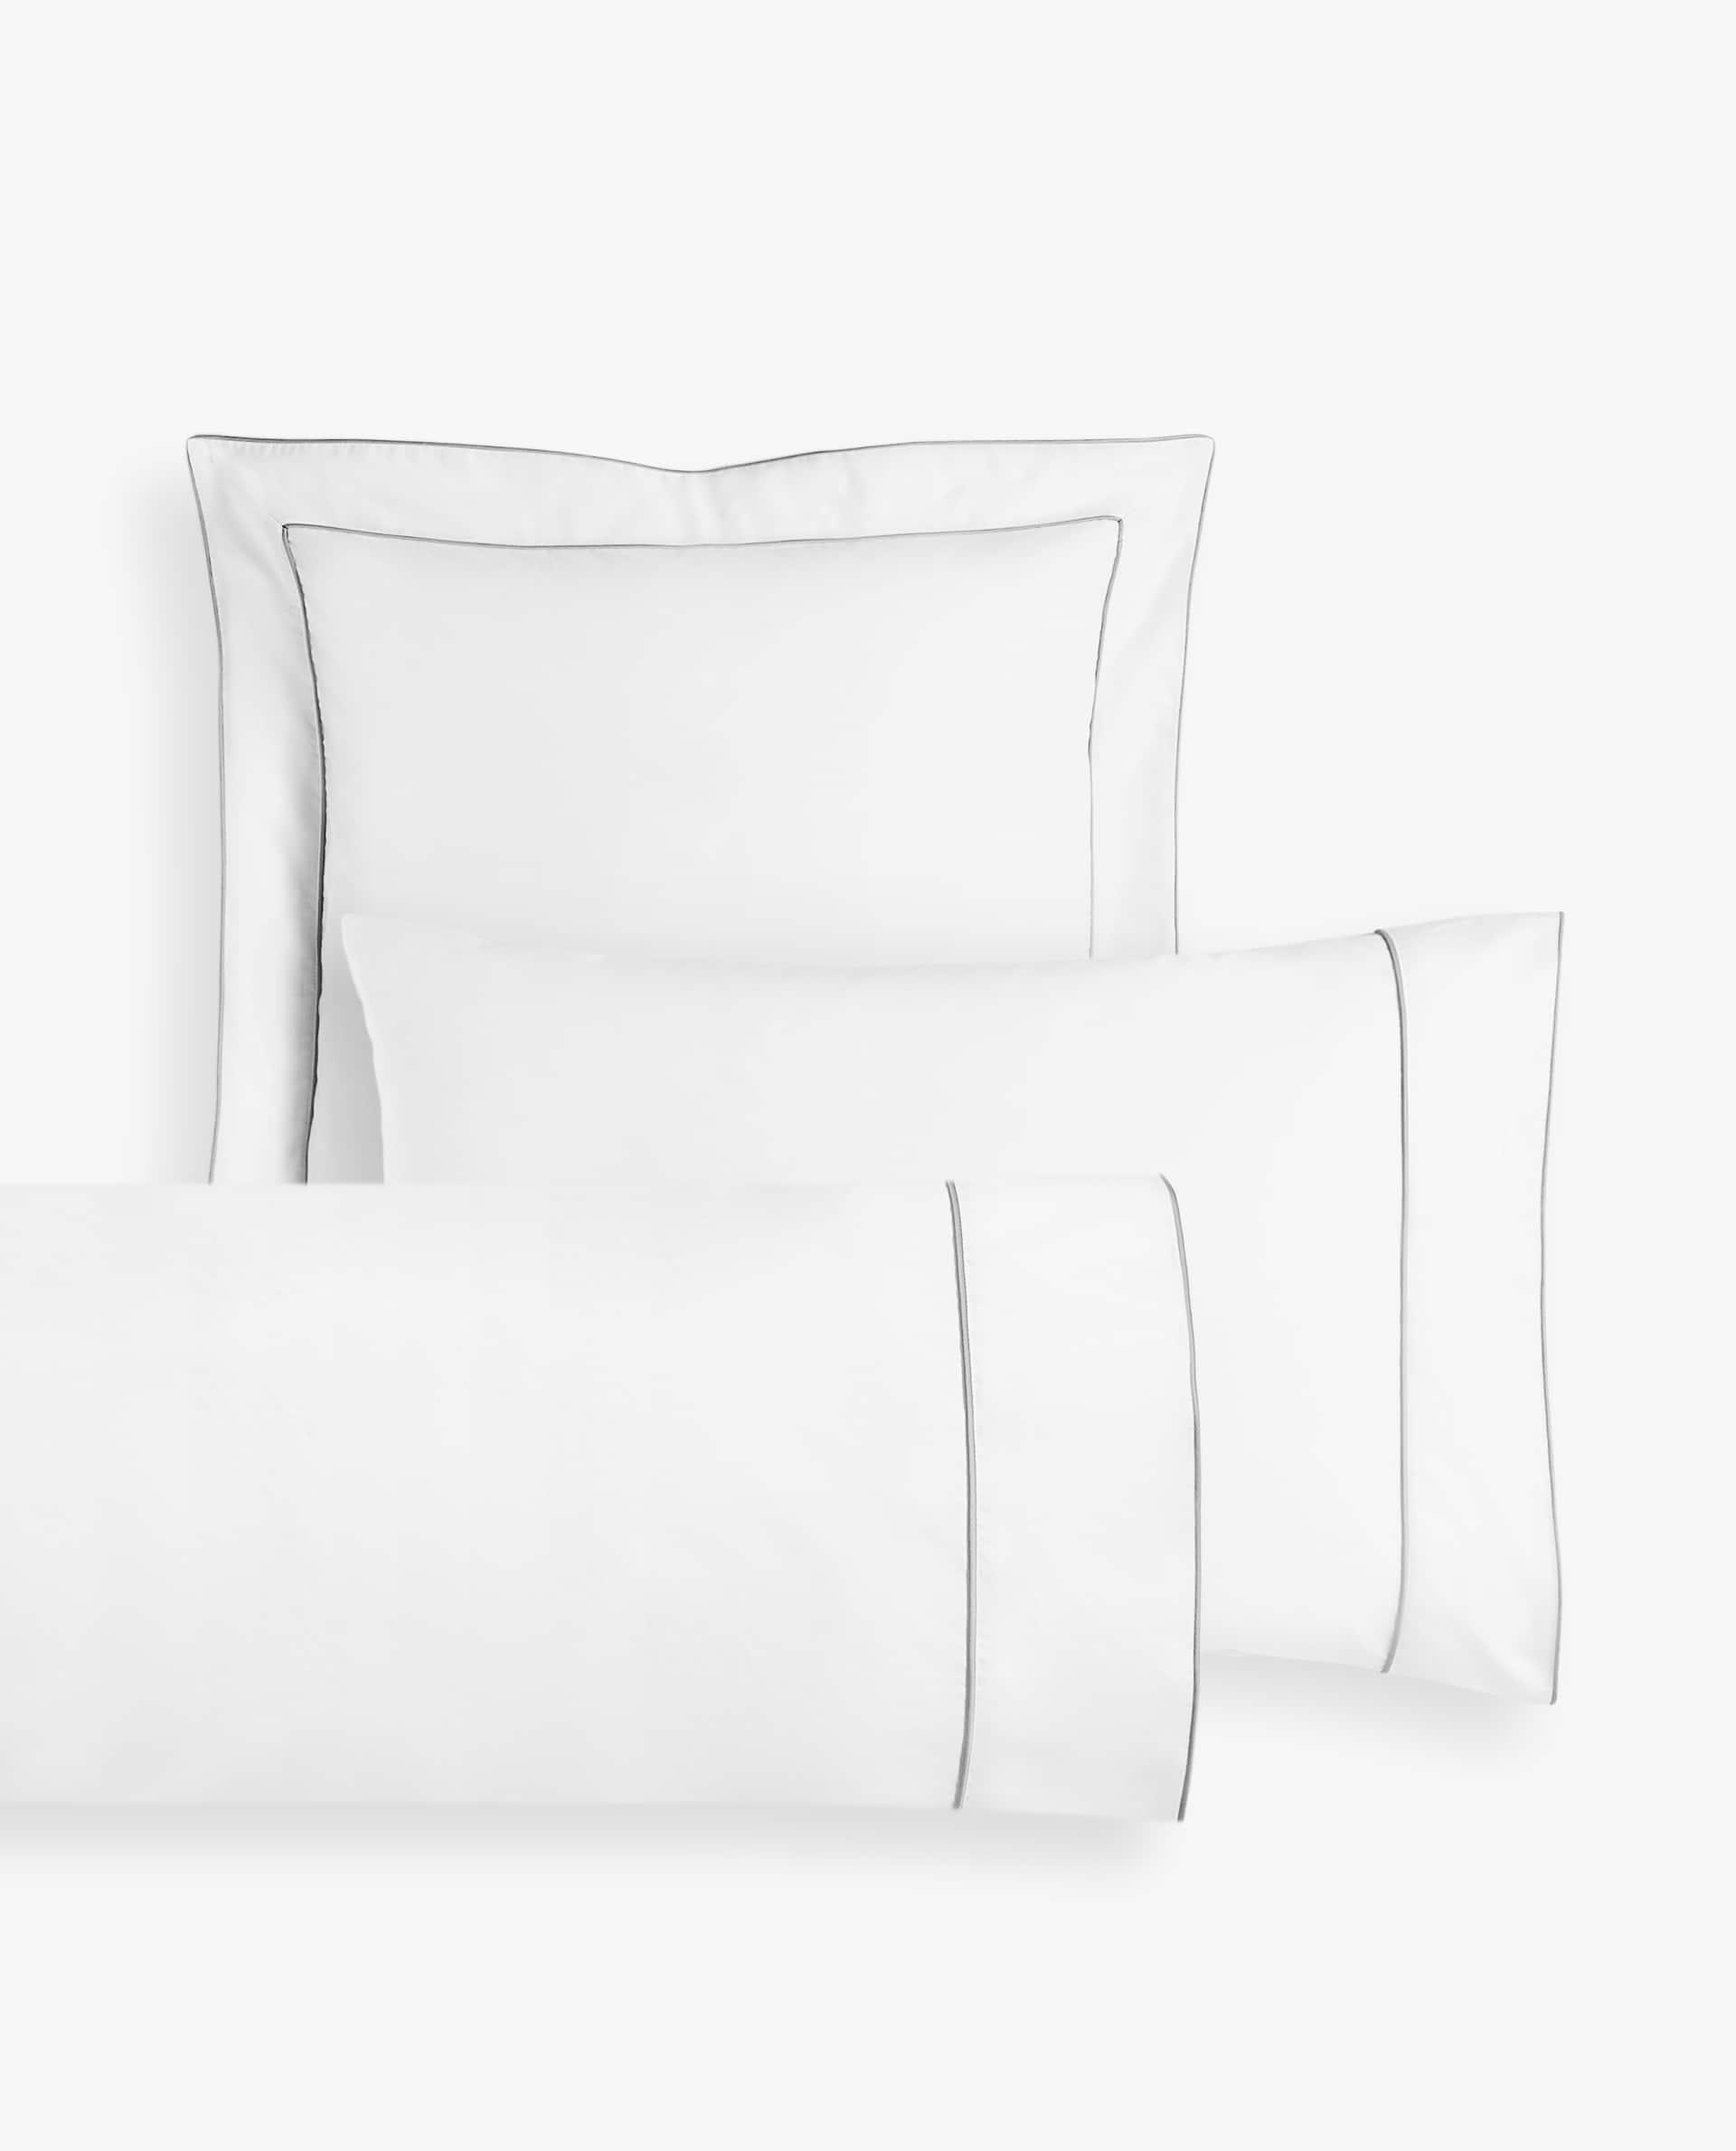 fundas para sofa en peru leather motion massage sectional funda de almohada piping contraste dormitorio